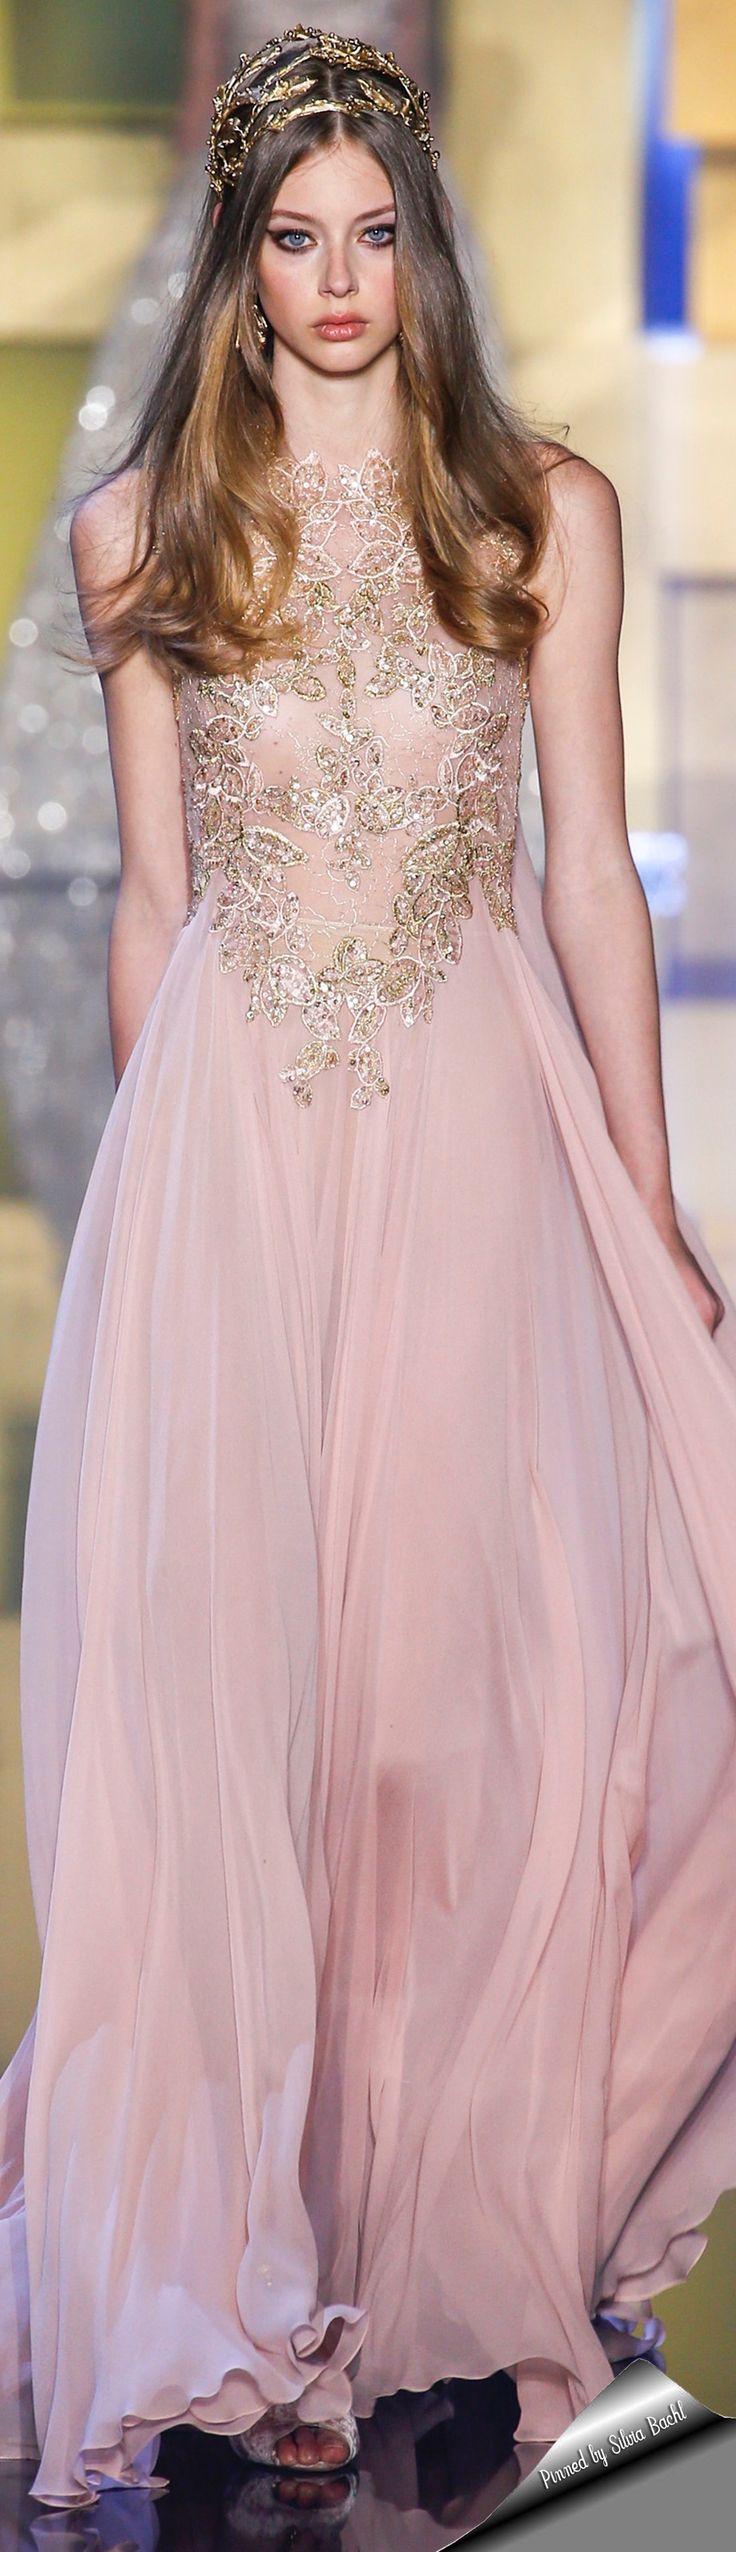 39 best vestidos largos images on Pinterest | Bridesmaids, Long prom ...